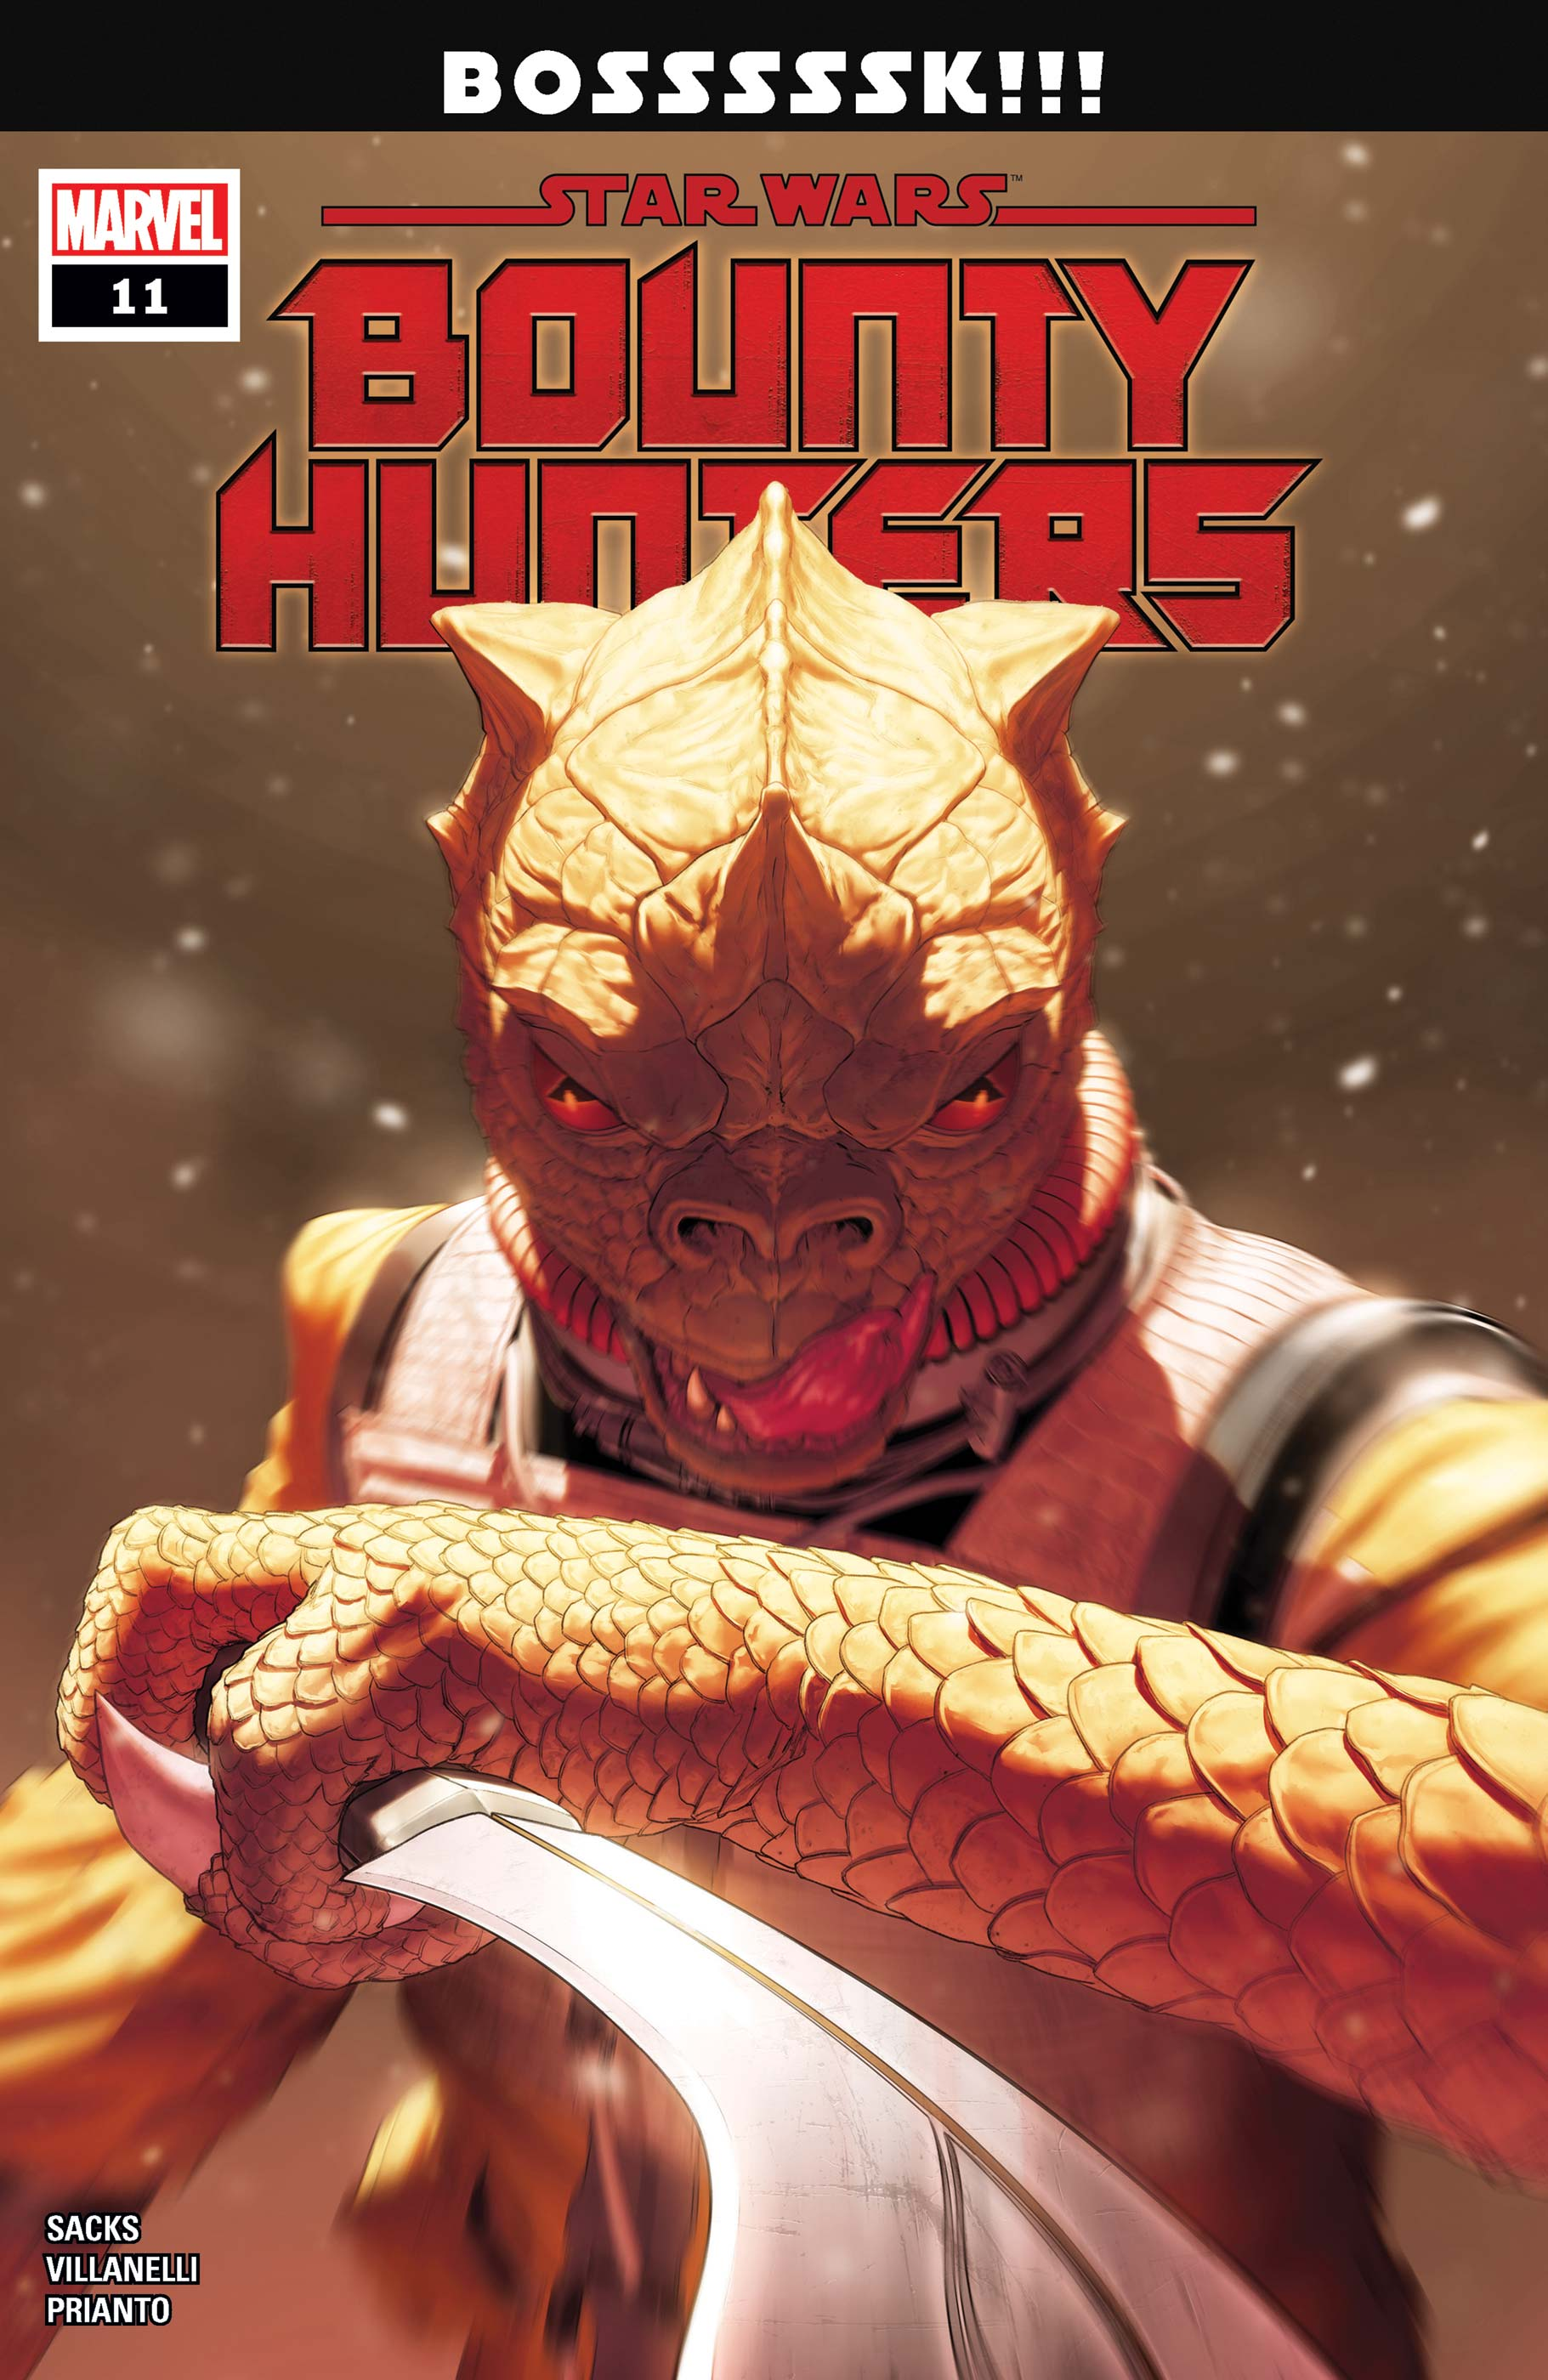 Star Wars: Bounty Hunters (2020) #11